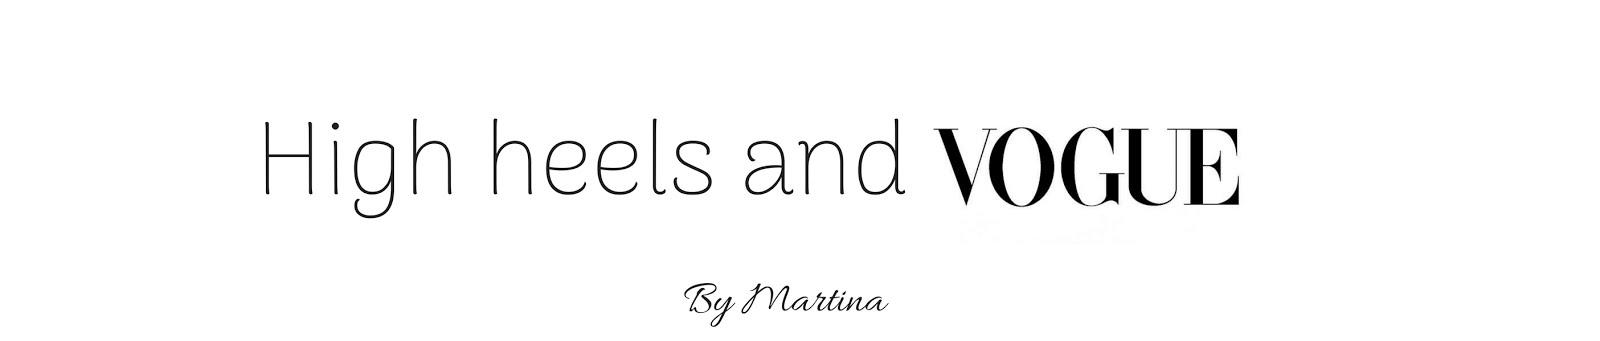 high heels & vogue